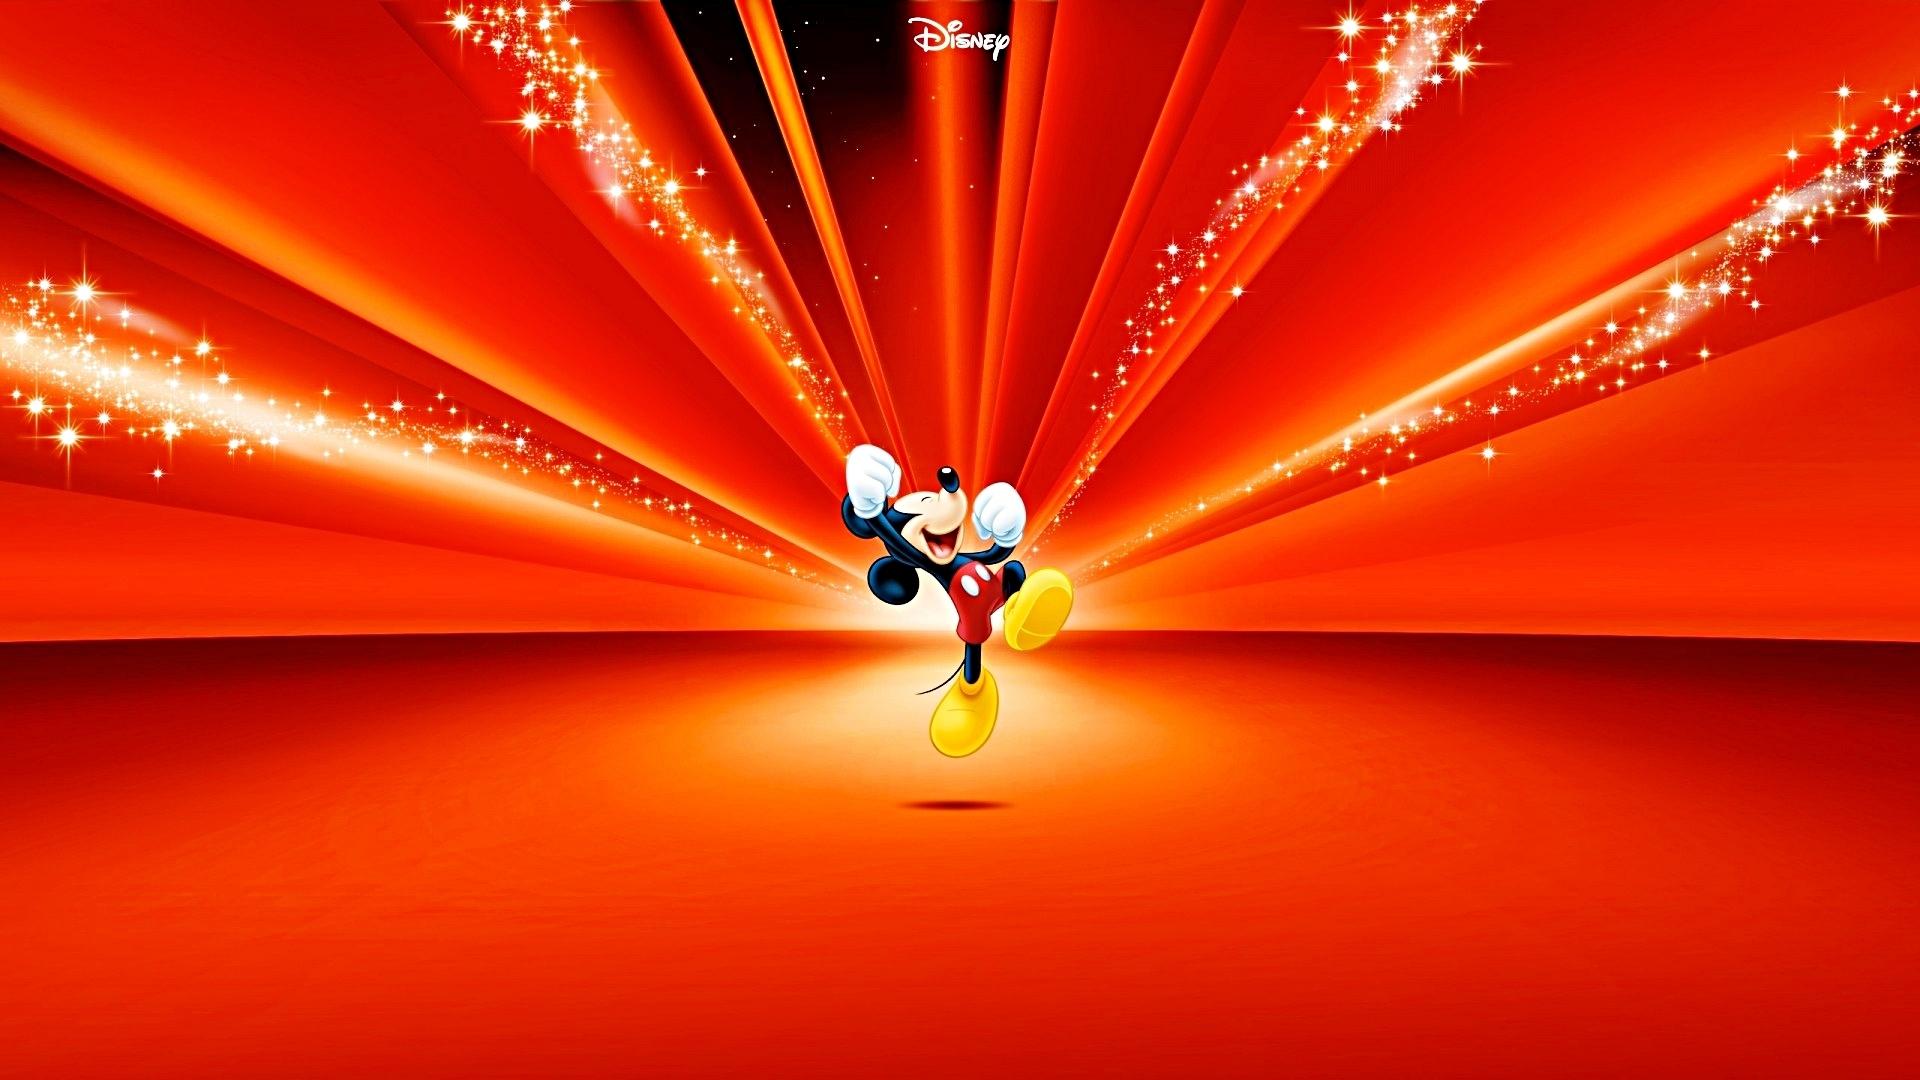 Walt Disney Wallpapers - Mickey Mouse